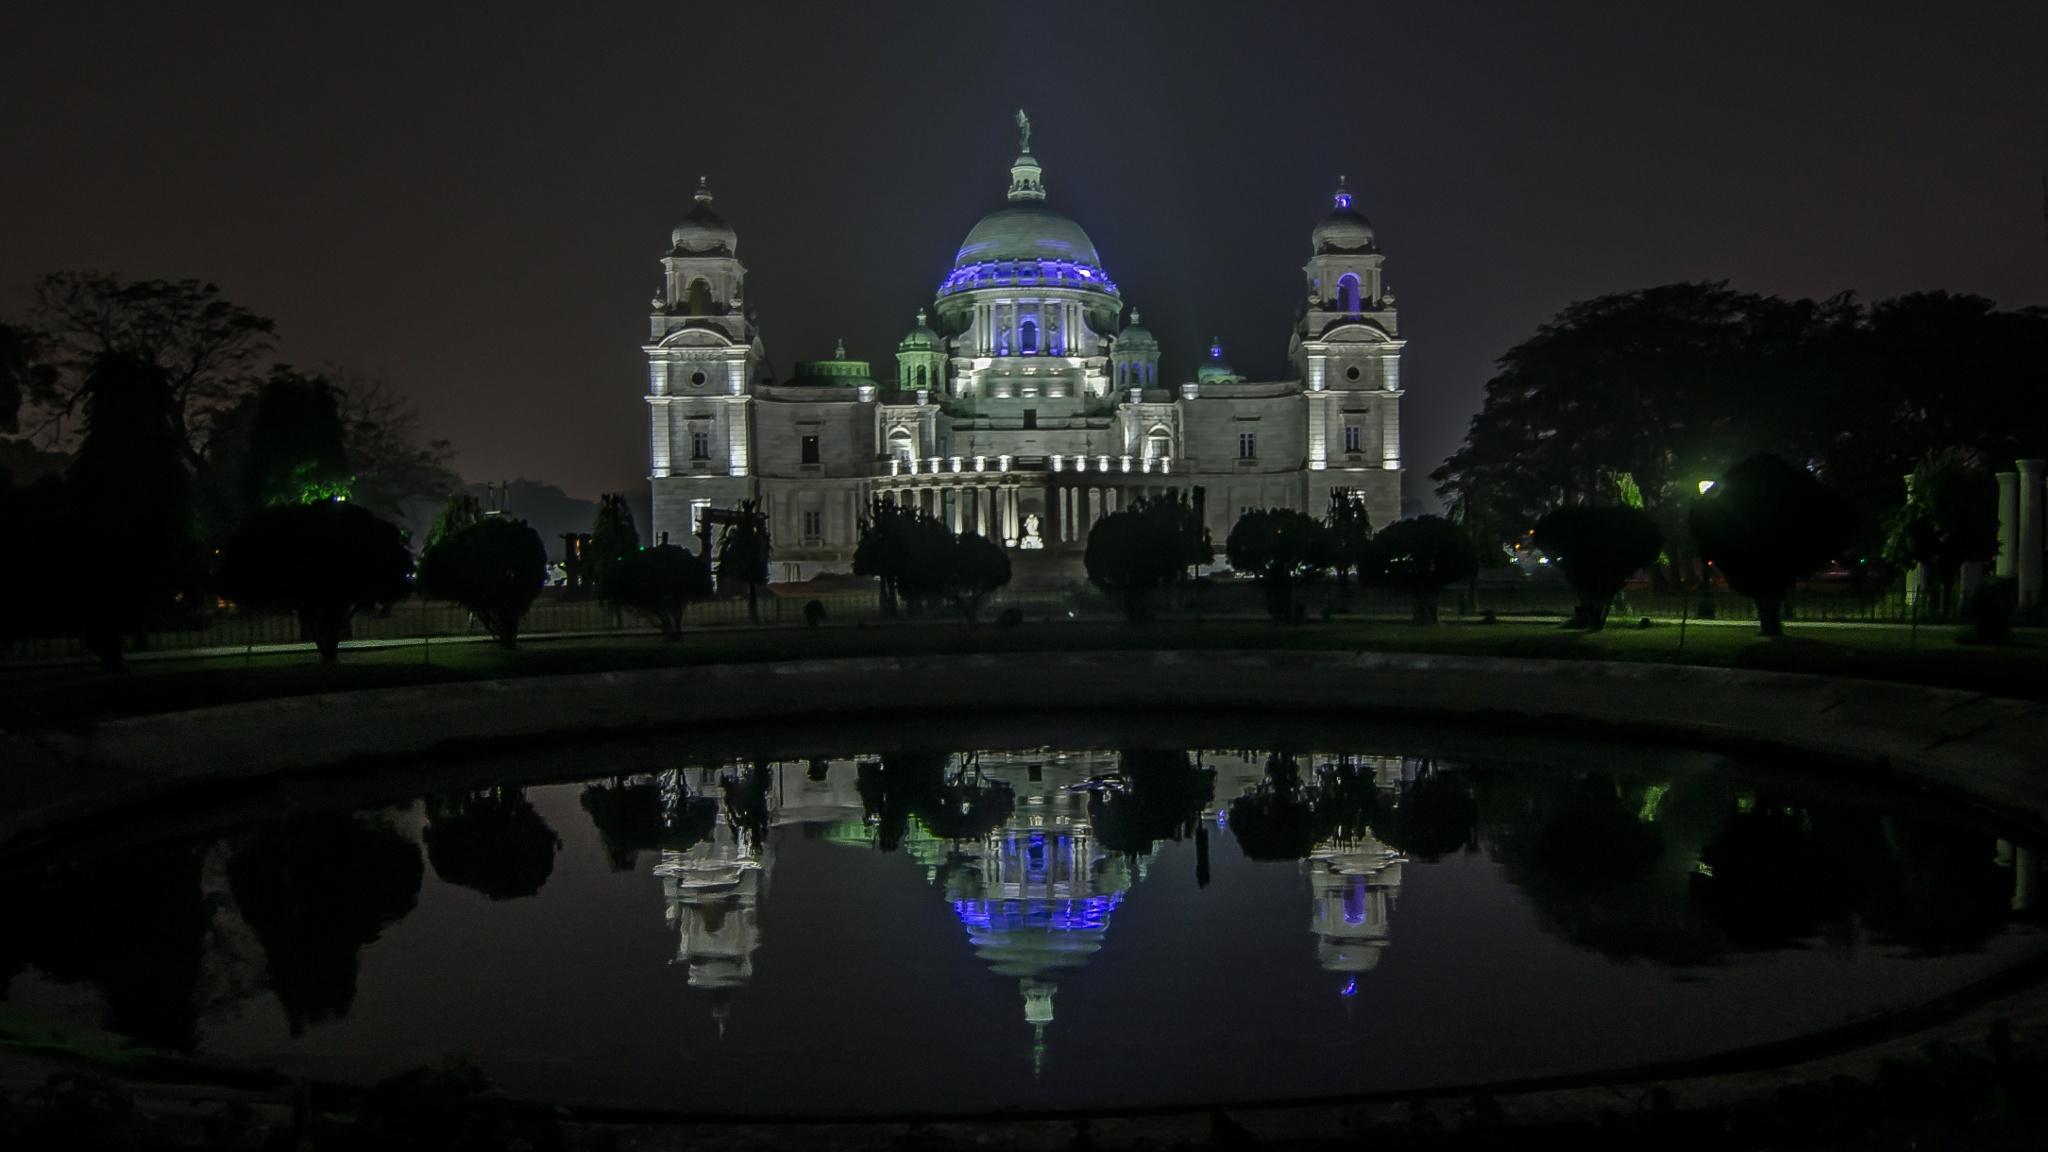 The Victoria Memorial Hall, Kolkata by adhikaryprabir12